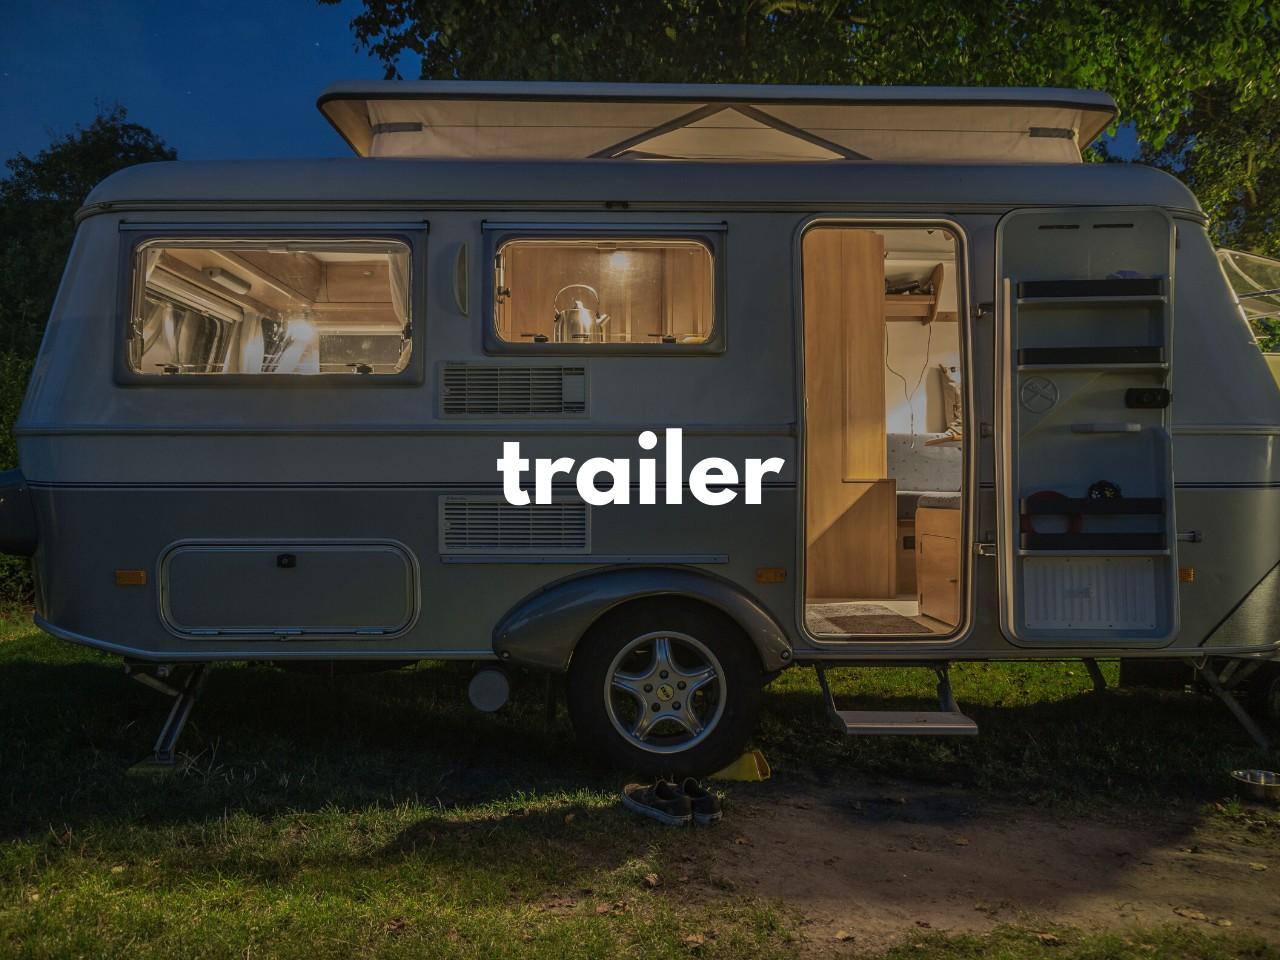 trailer : 車で引く移動住宅